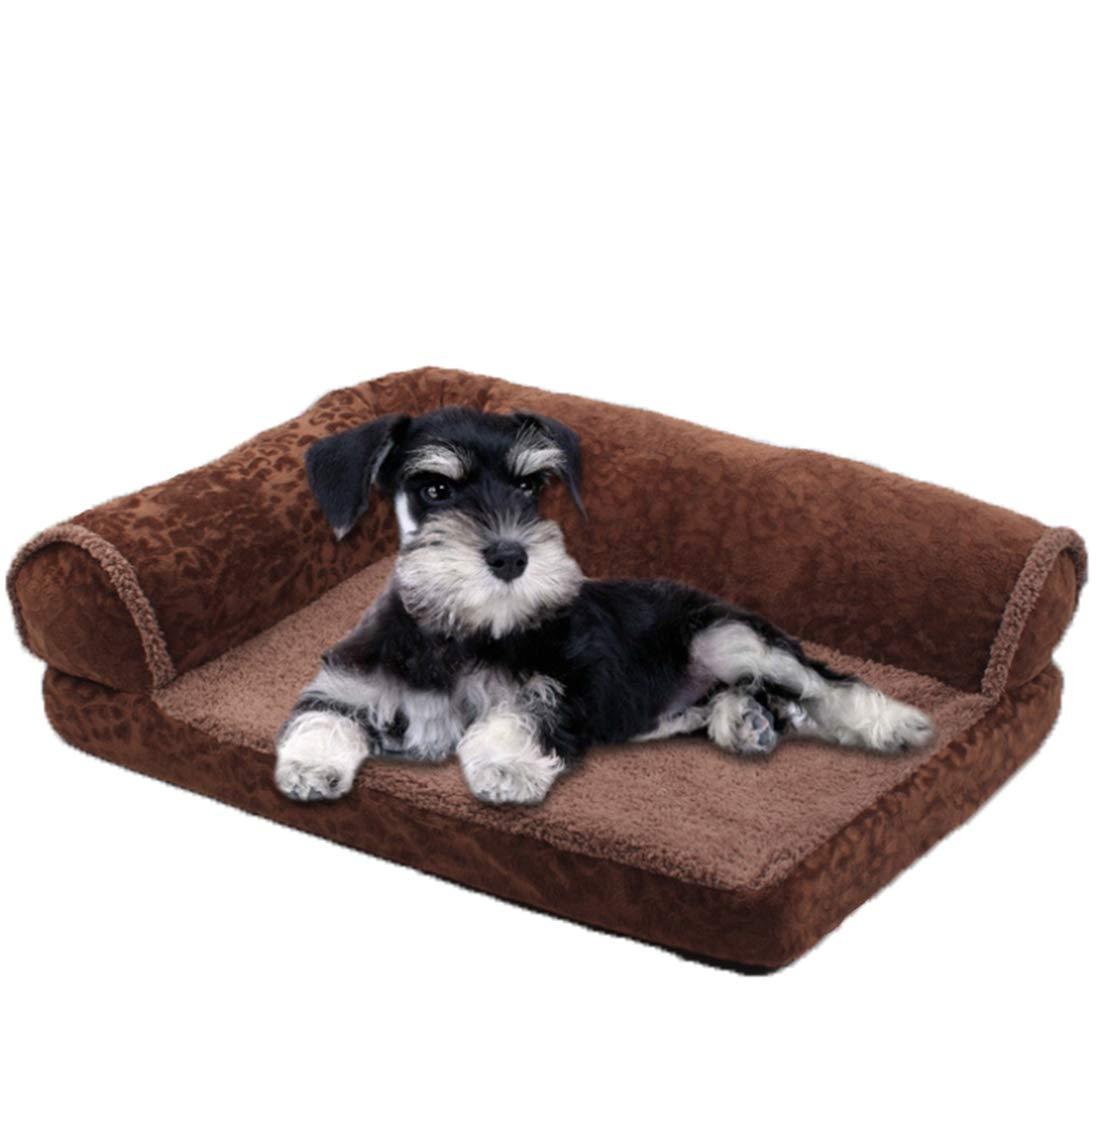 Large Comfortable Short Velvet Kennel Pet Waterloo Cat nest Dog Sofa Dog Bed Detachable Washable Dirt Resistant Bite Resistance Dark Brown   3 Sizes